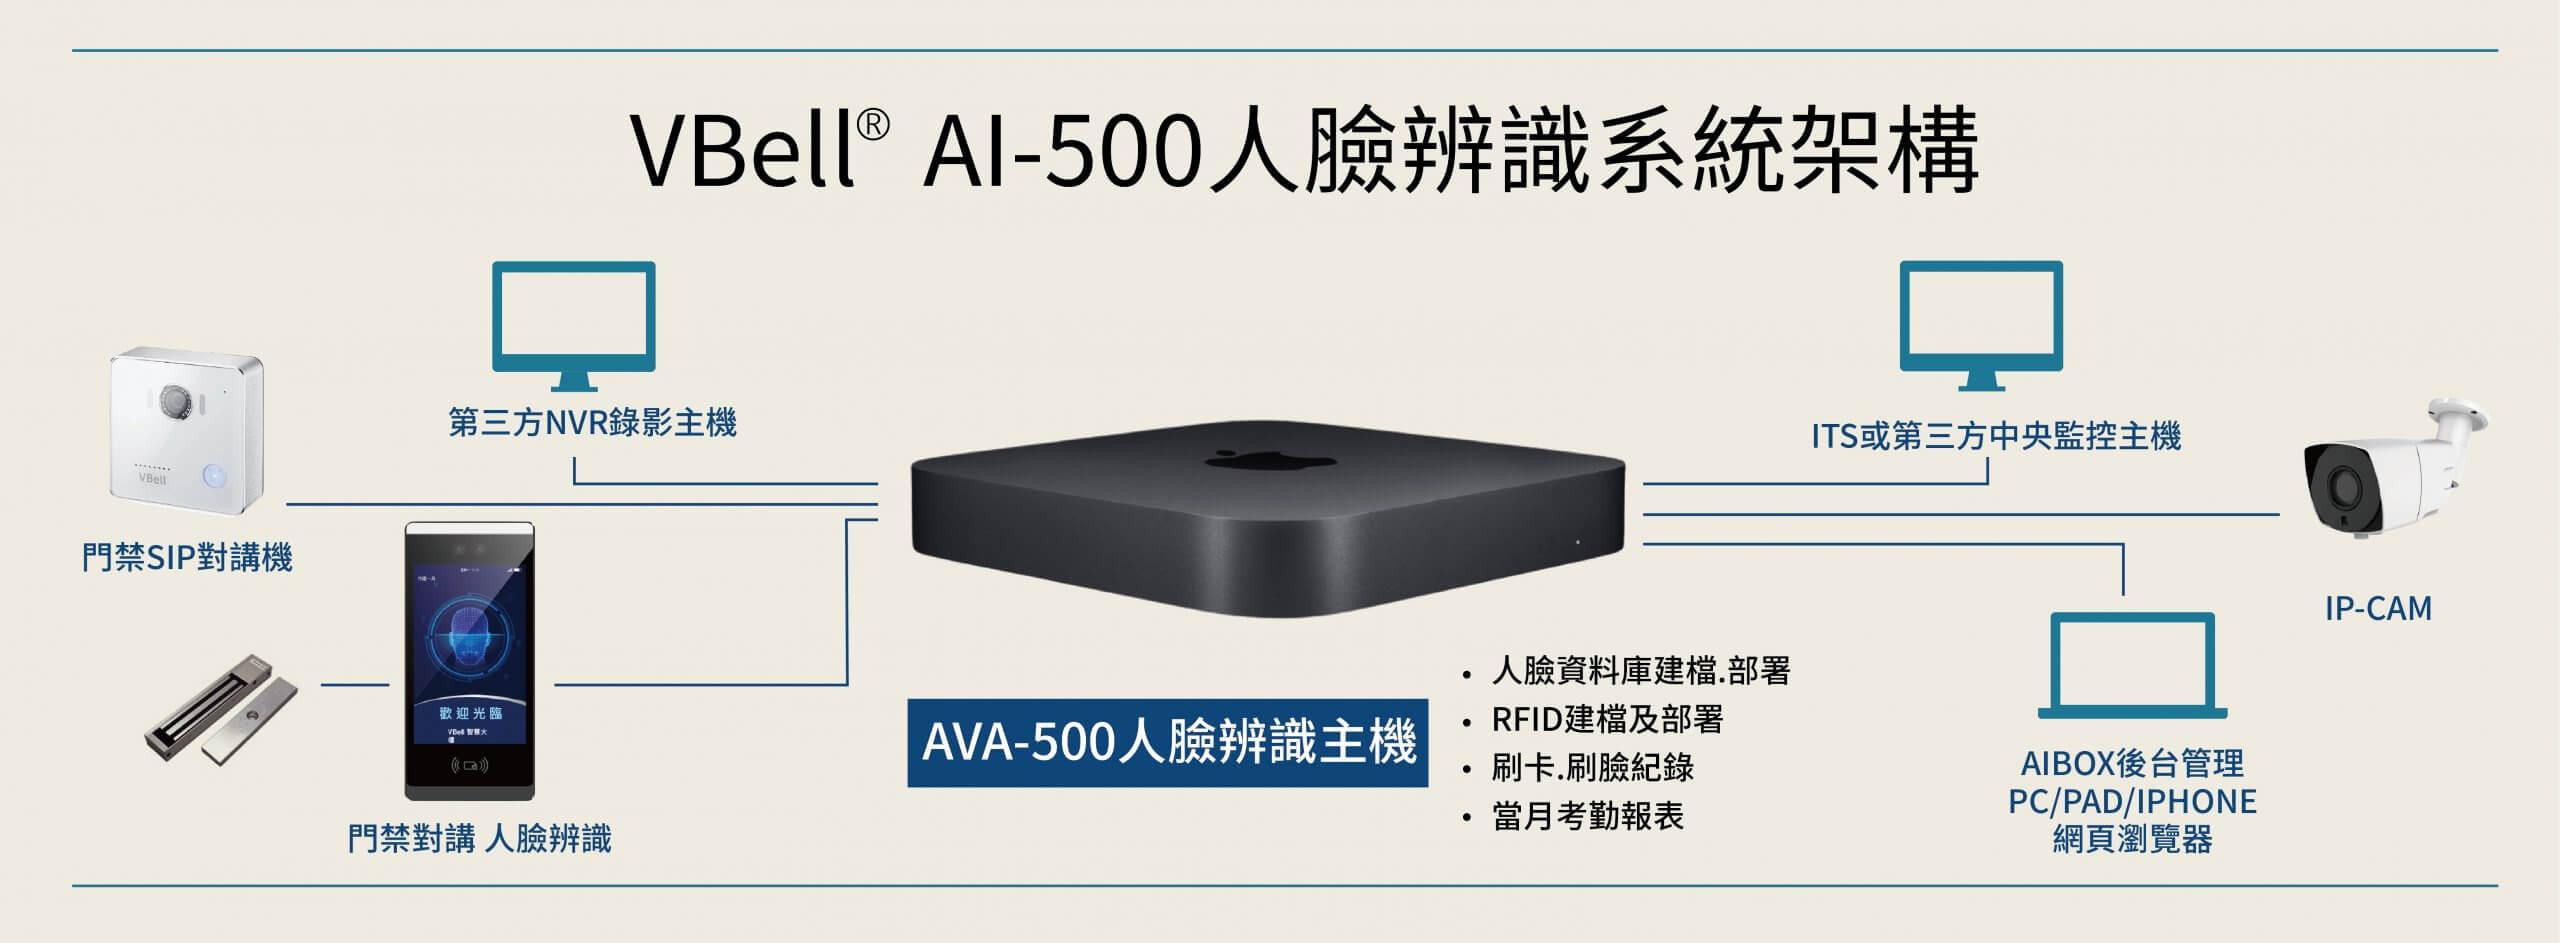 AVA-500人臉辨識後台主機